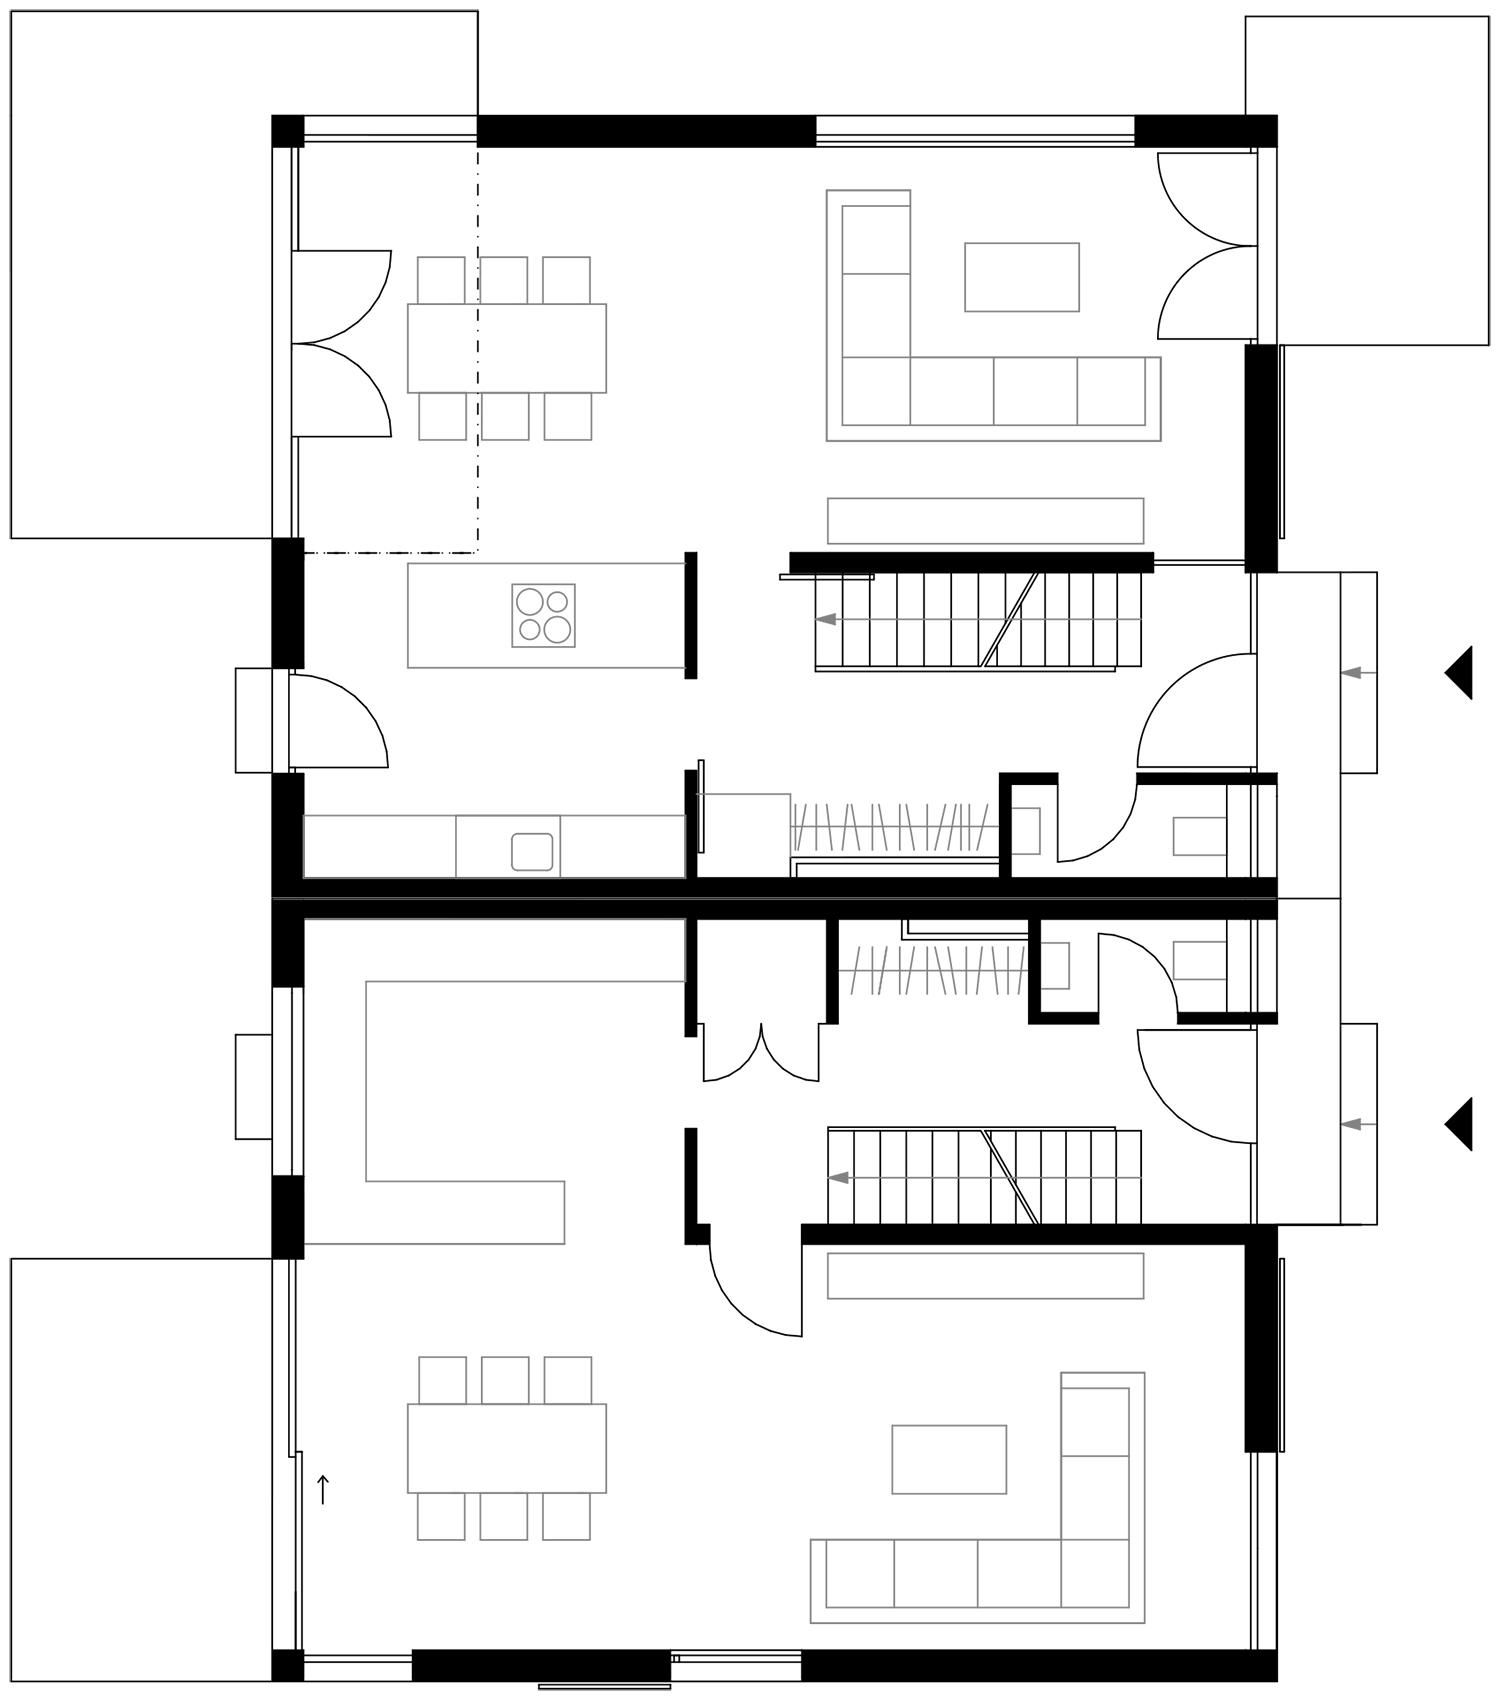 https://www.architectoo.de/images/1031t.jpg